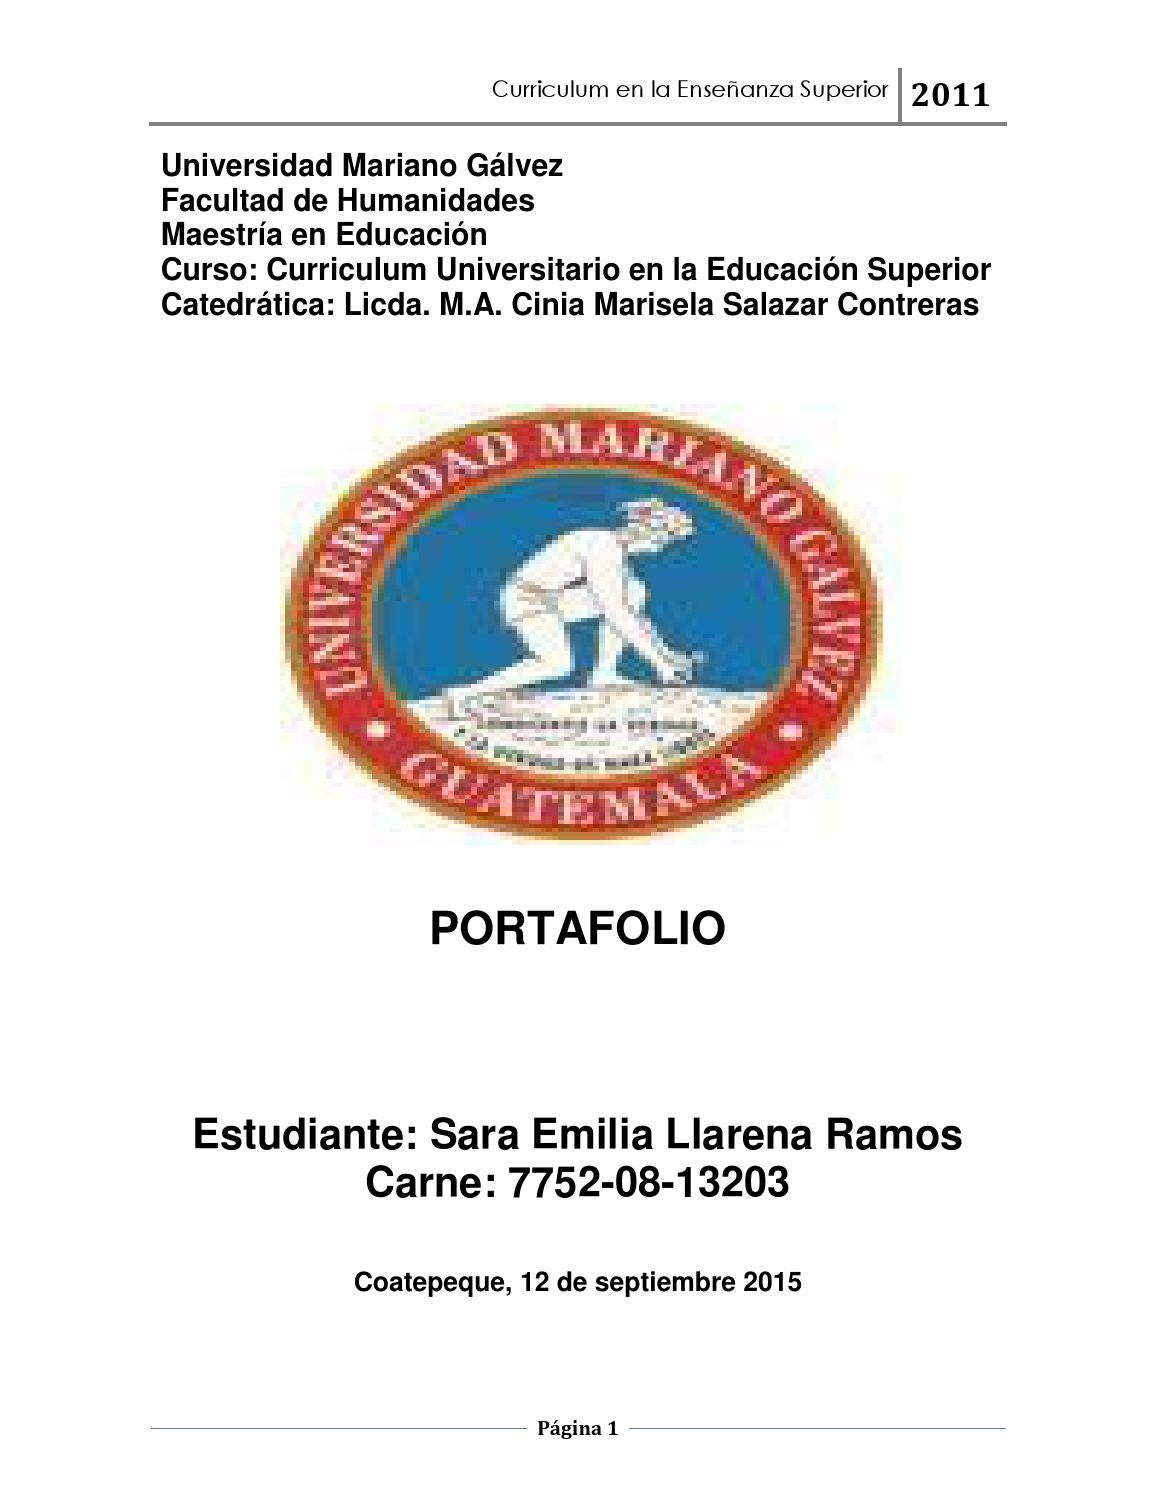 Portafolio curso de curriculo by Sara Emilia Llarena - issuu